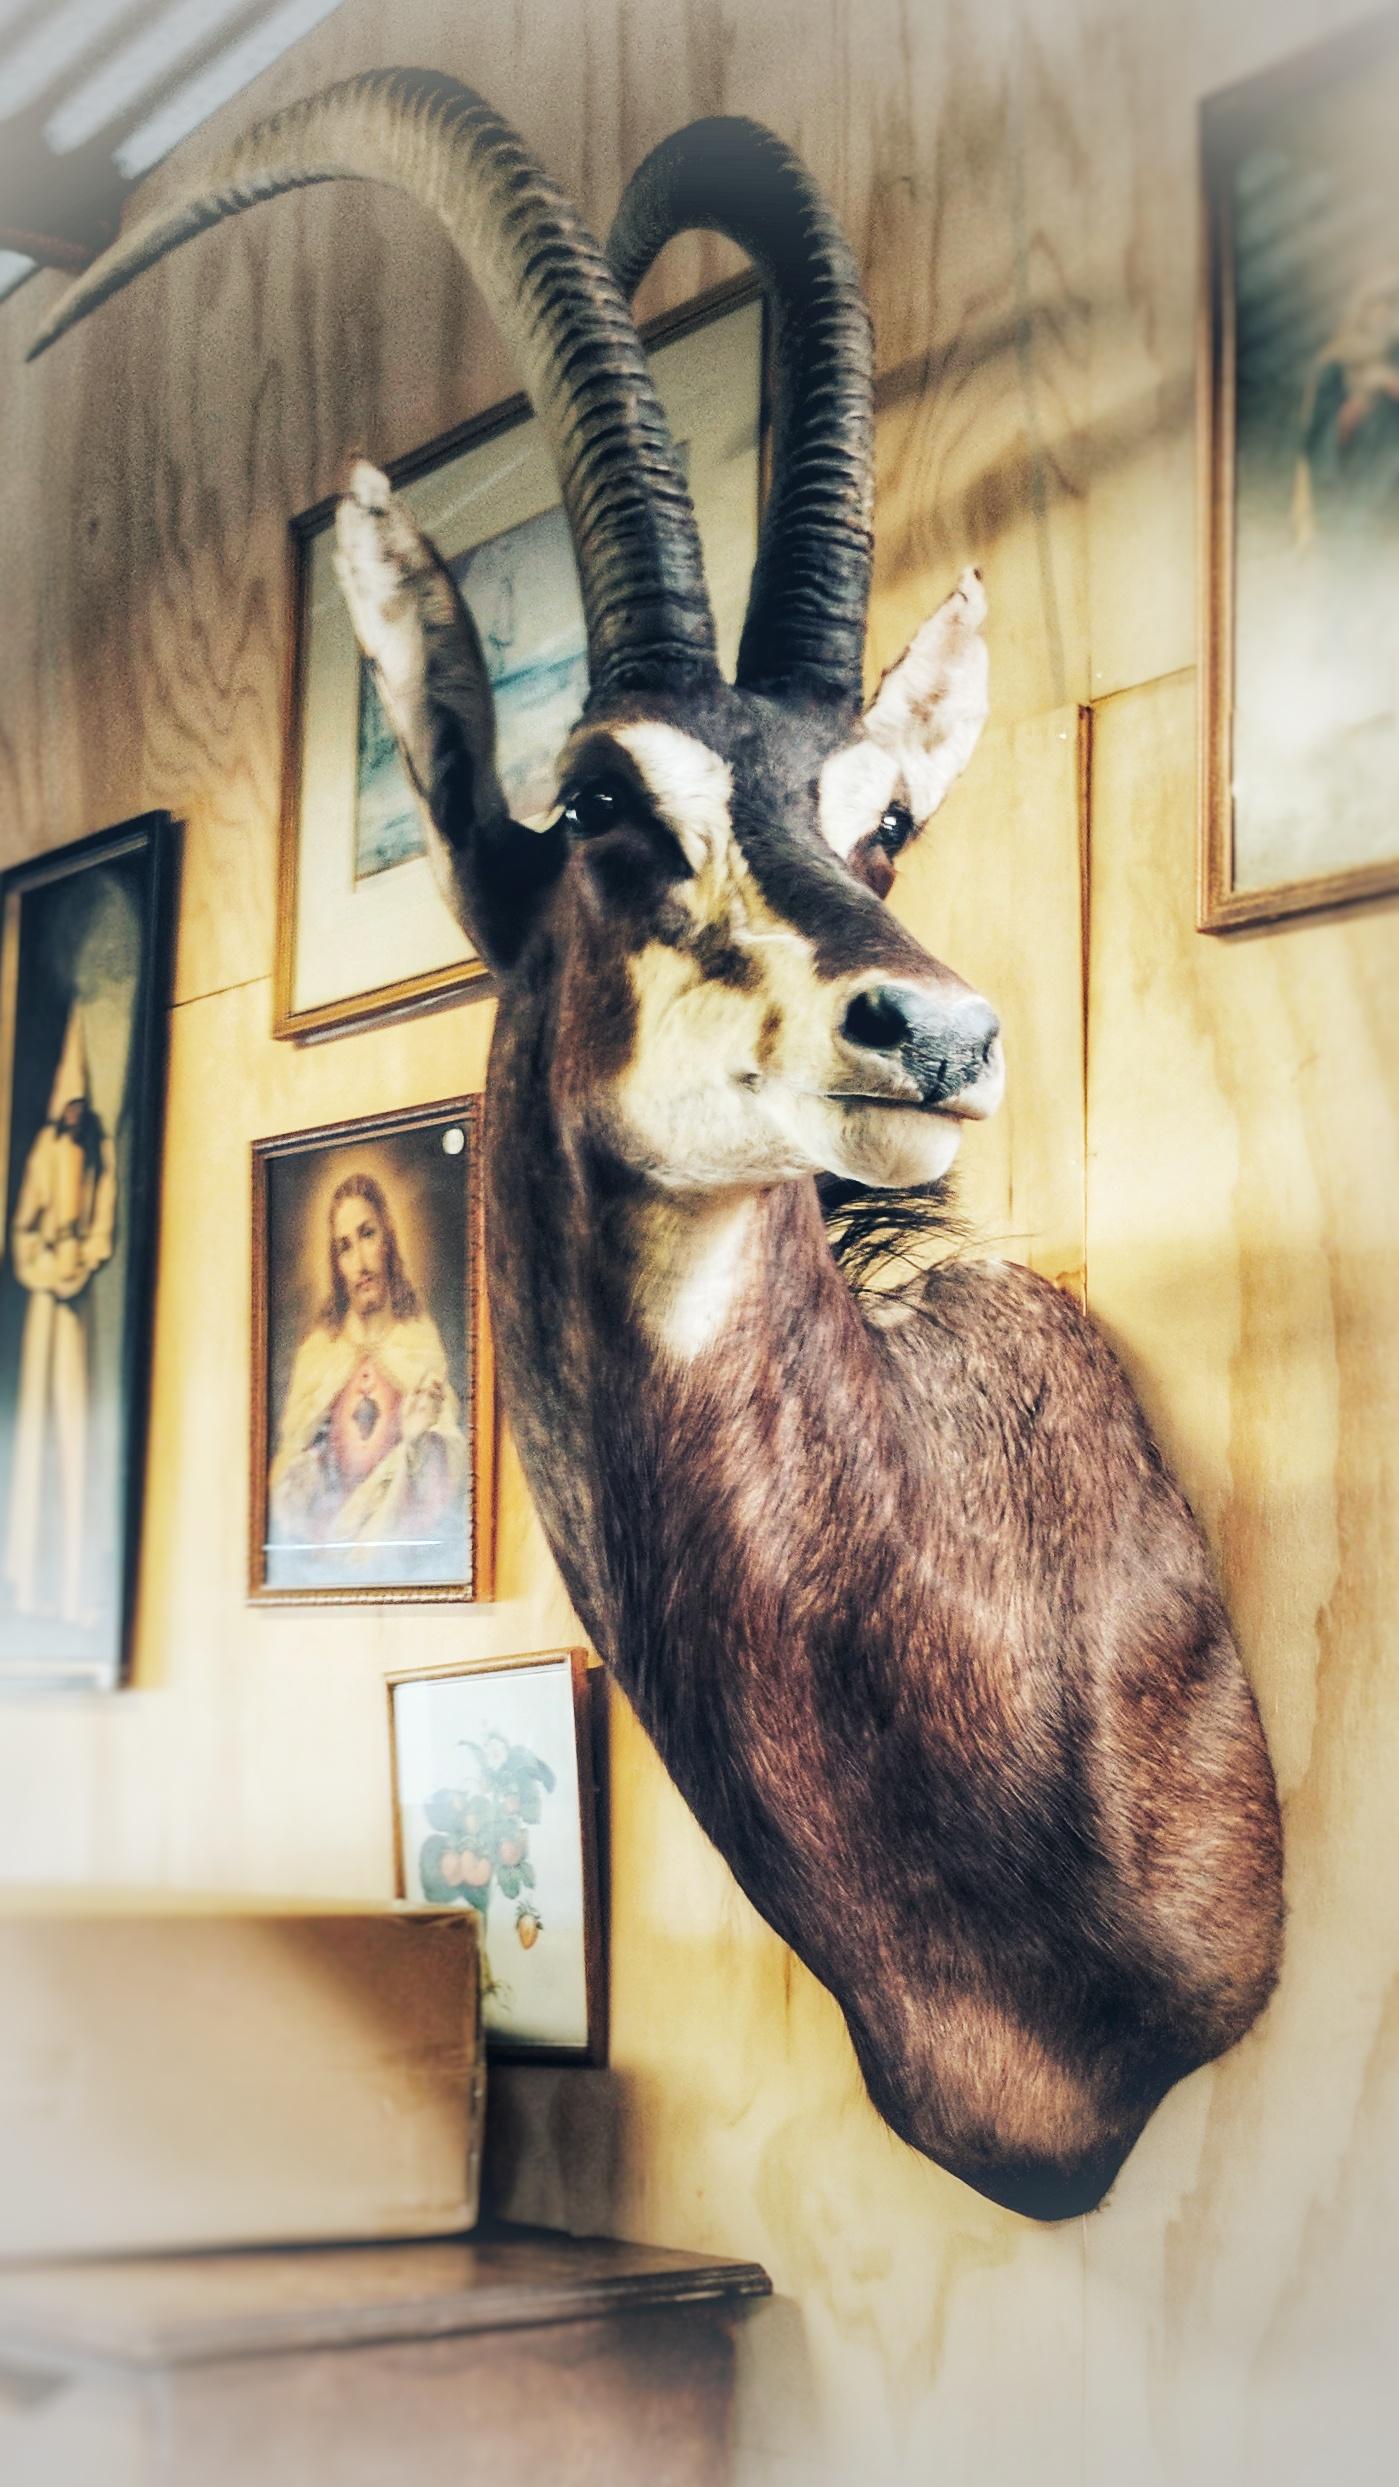 Antelopes head at the old Mumma T Trading Lounge (Amberley)